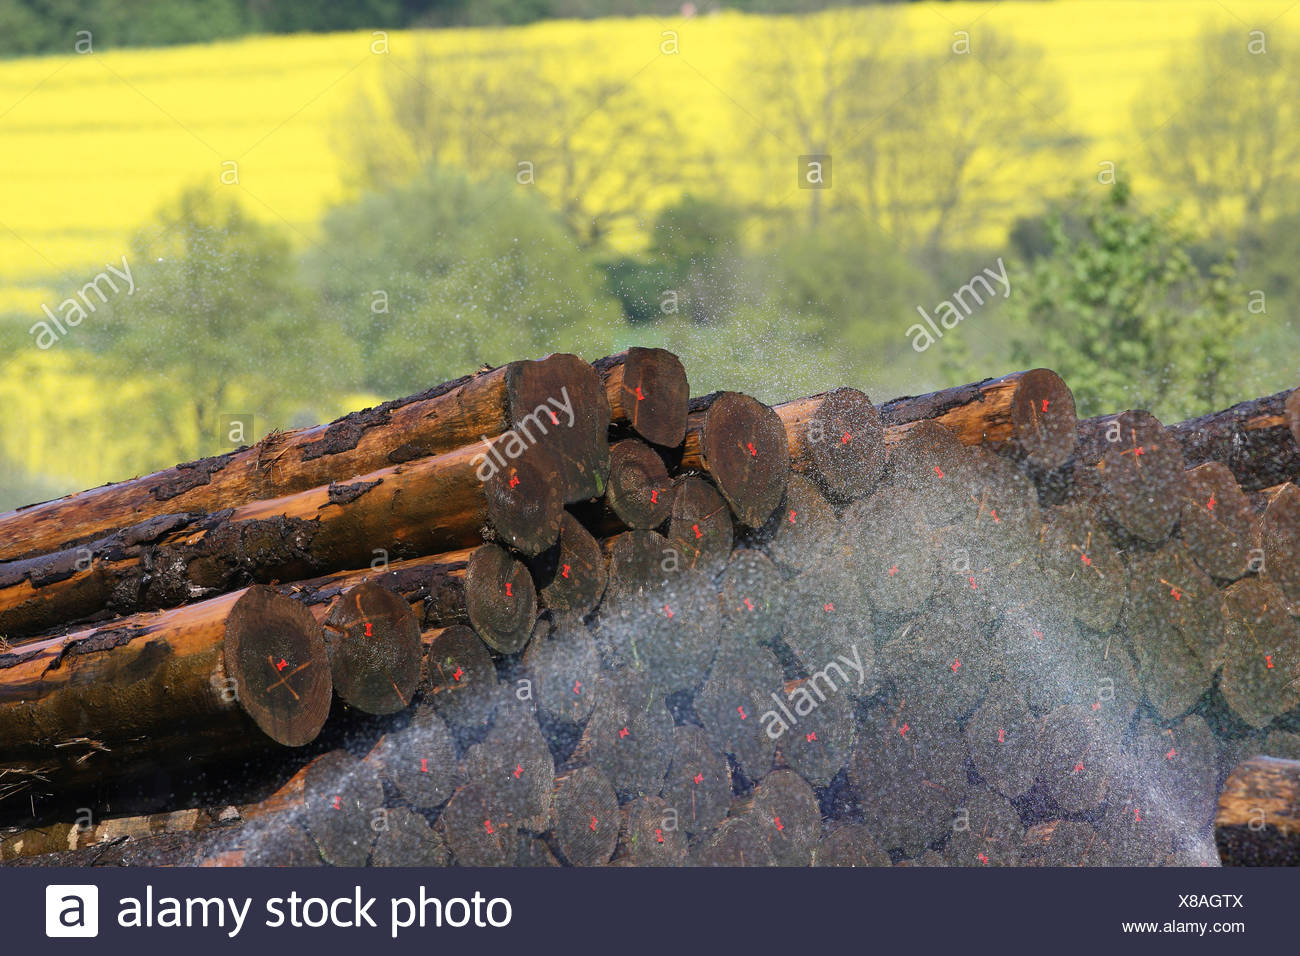 watering of timbers, Germany, North Rhine-Westphalia - Stock Image